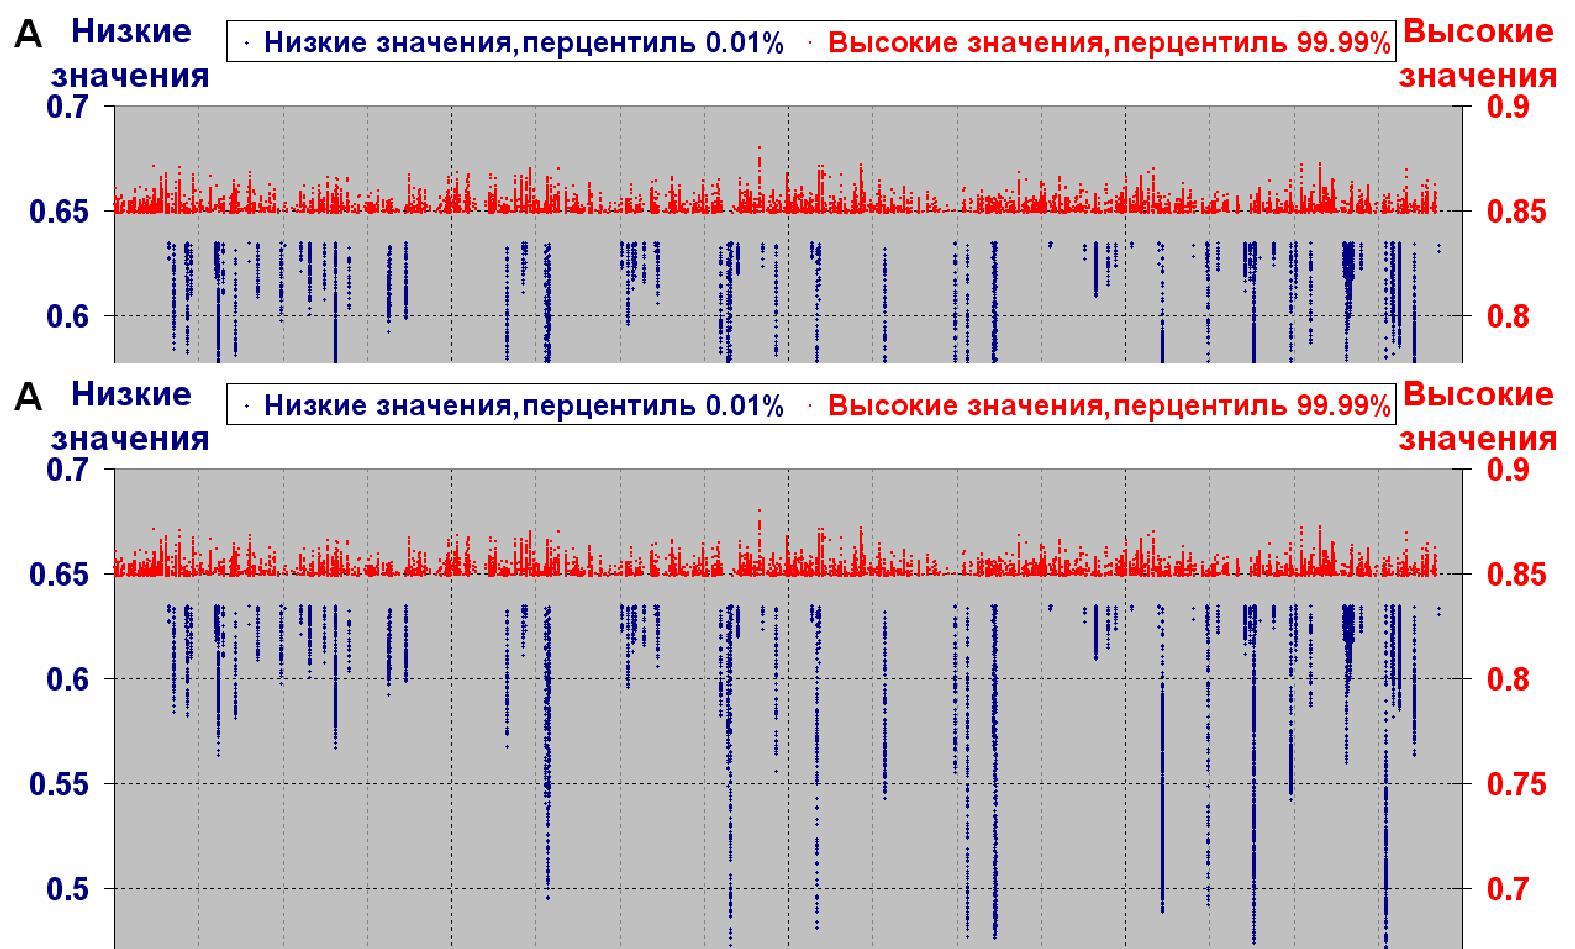 http://www.bionet.nsc.ru/images/important/5_1.JPG